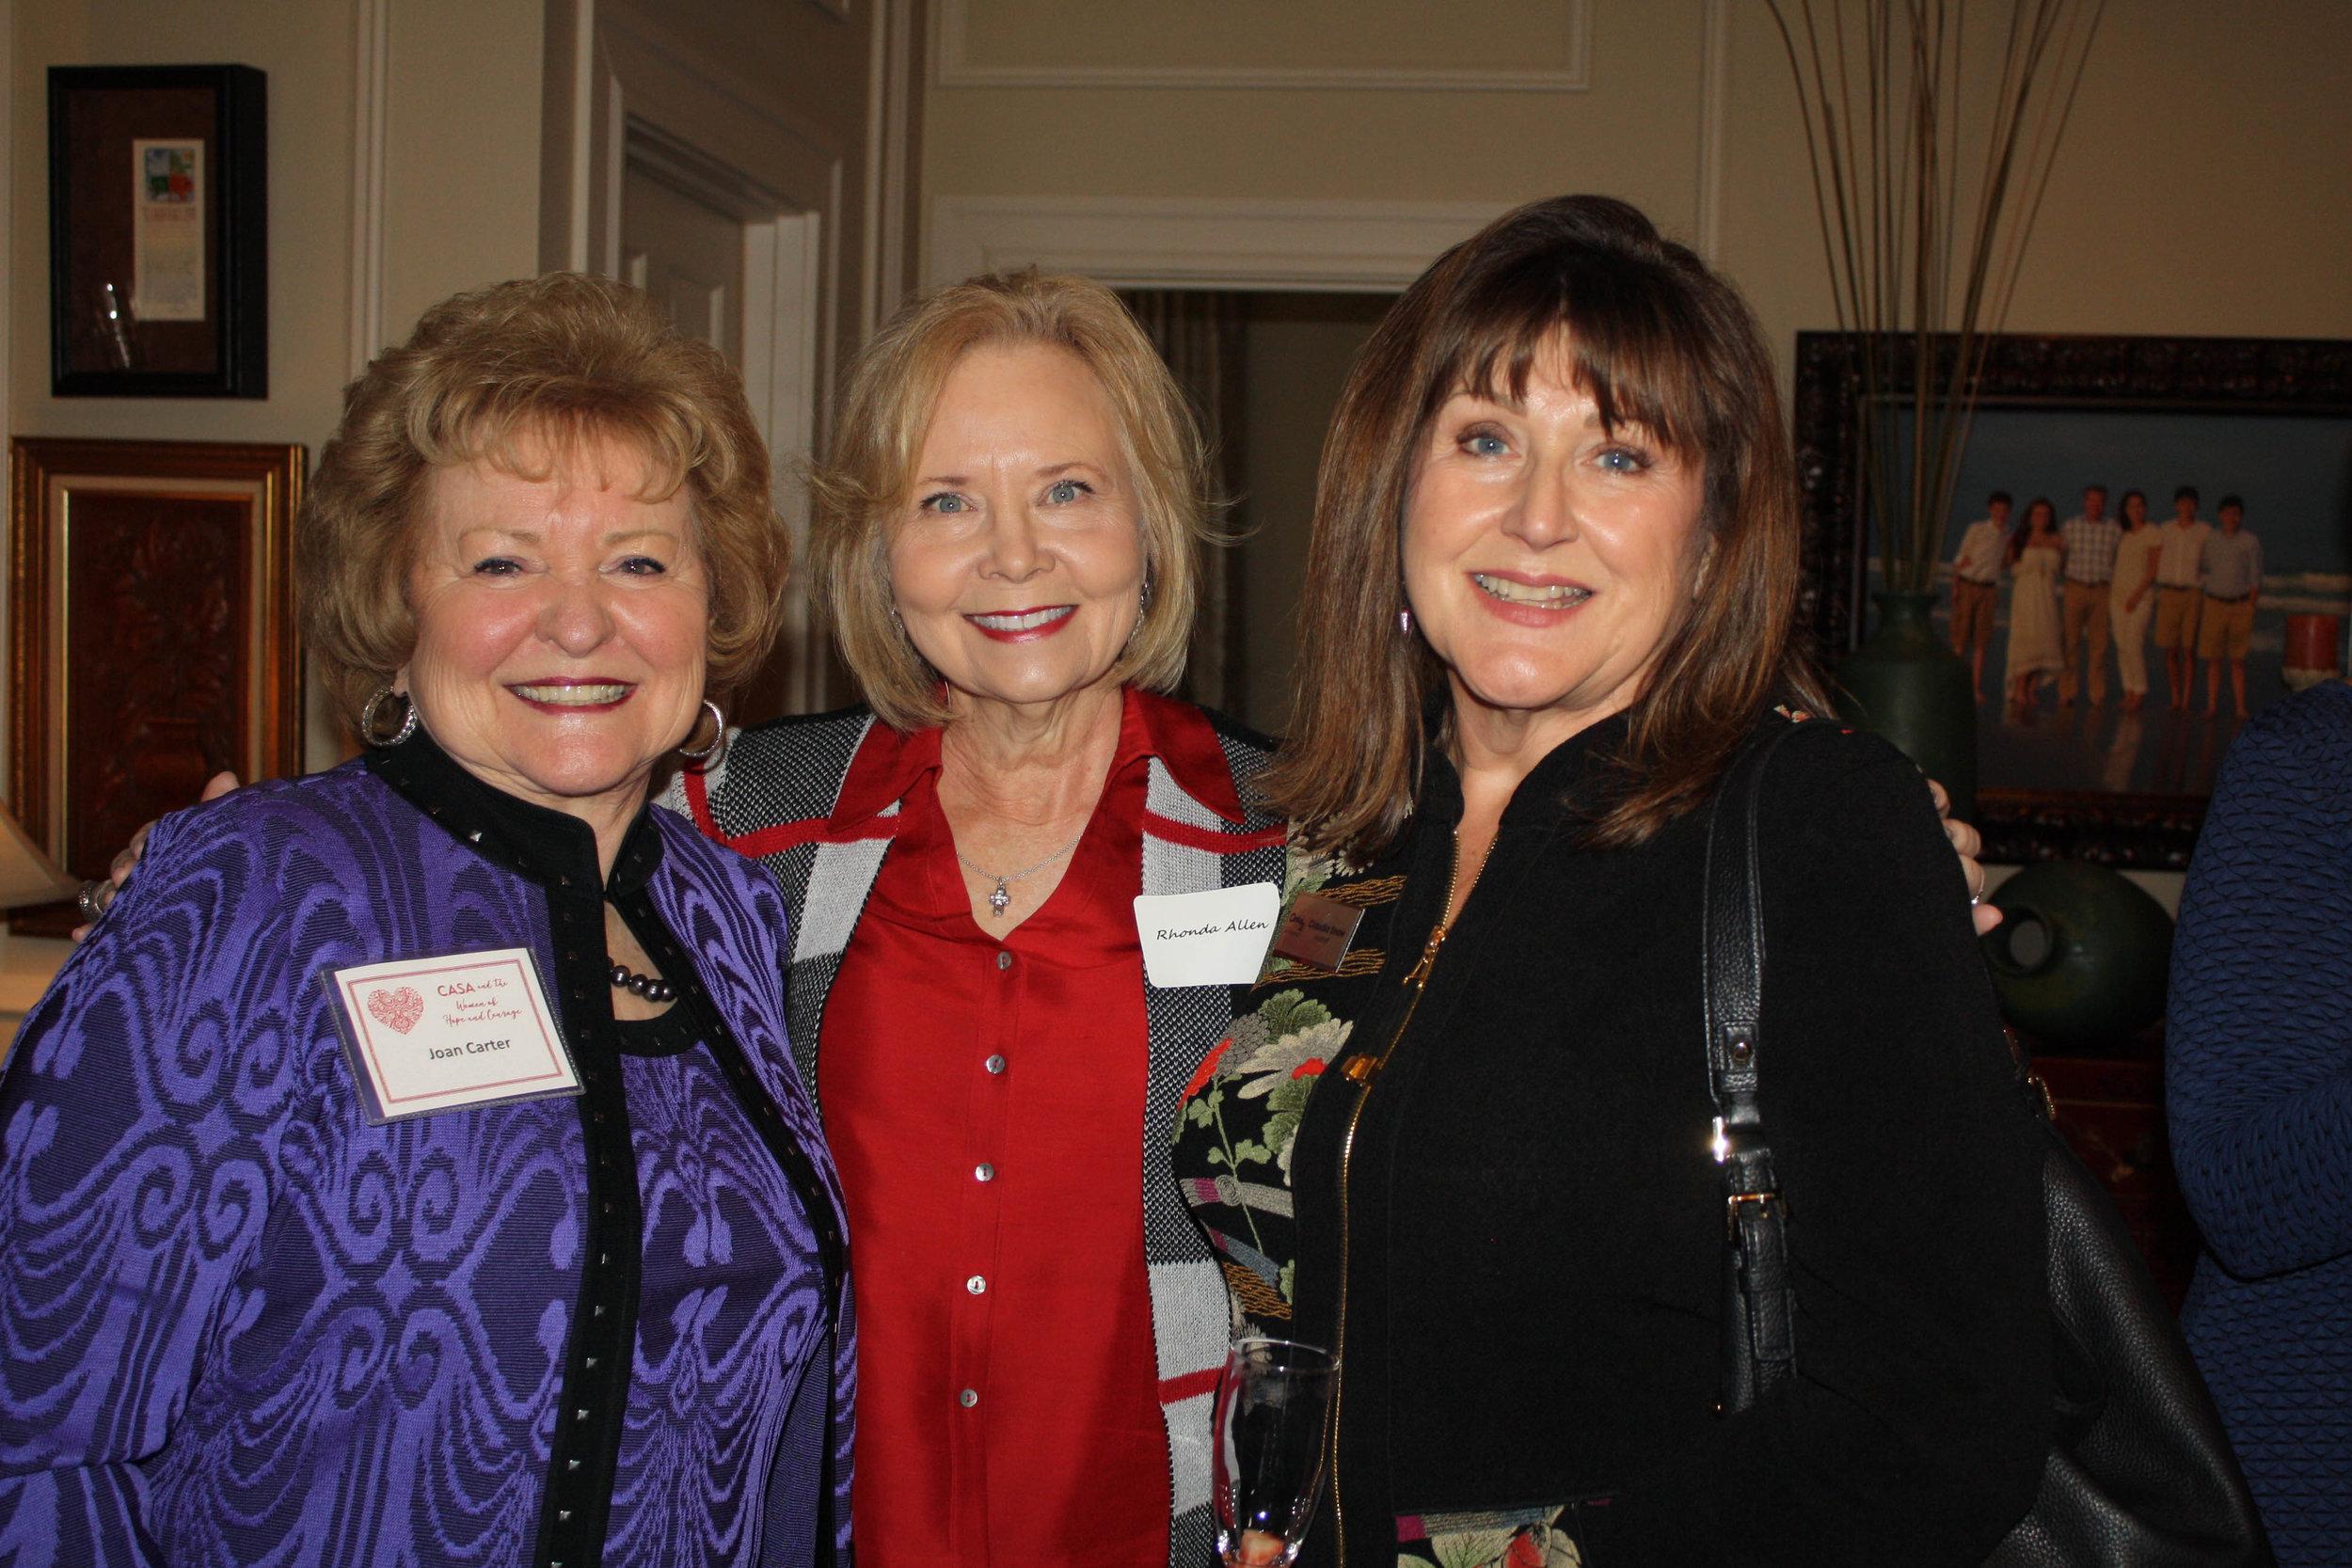 Joan Carter, Rhonda Allen and Claudia Snow